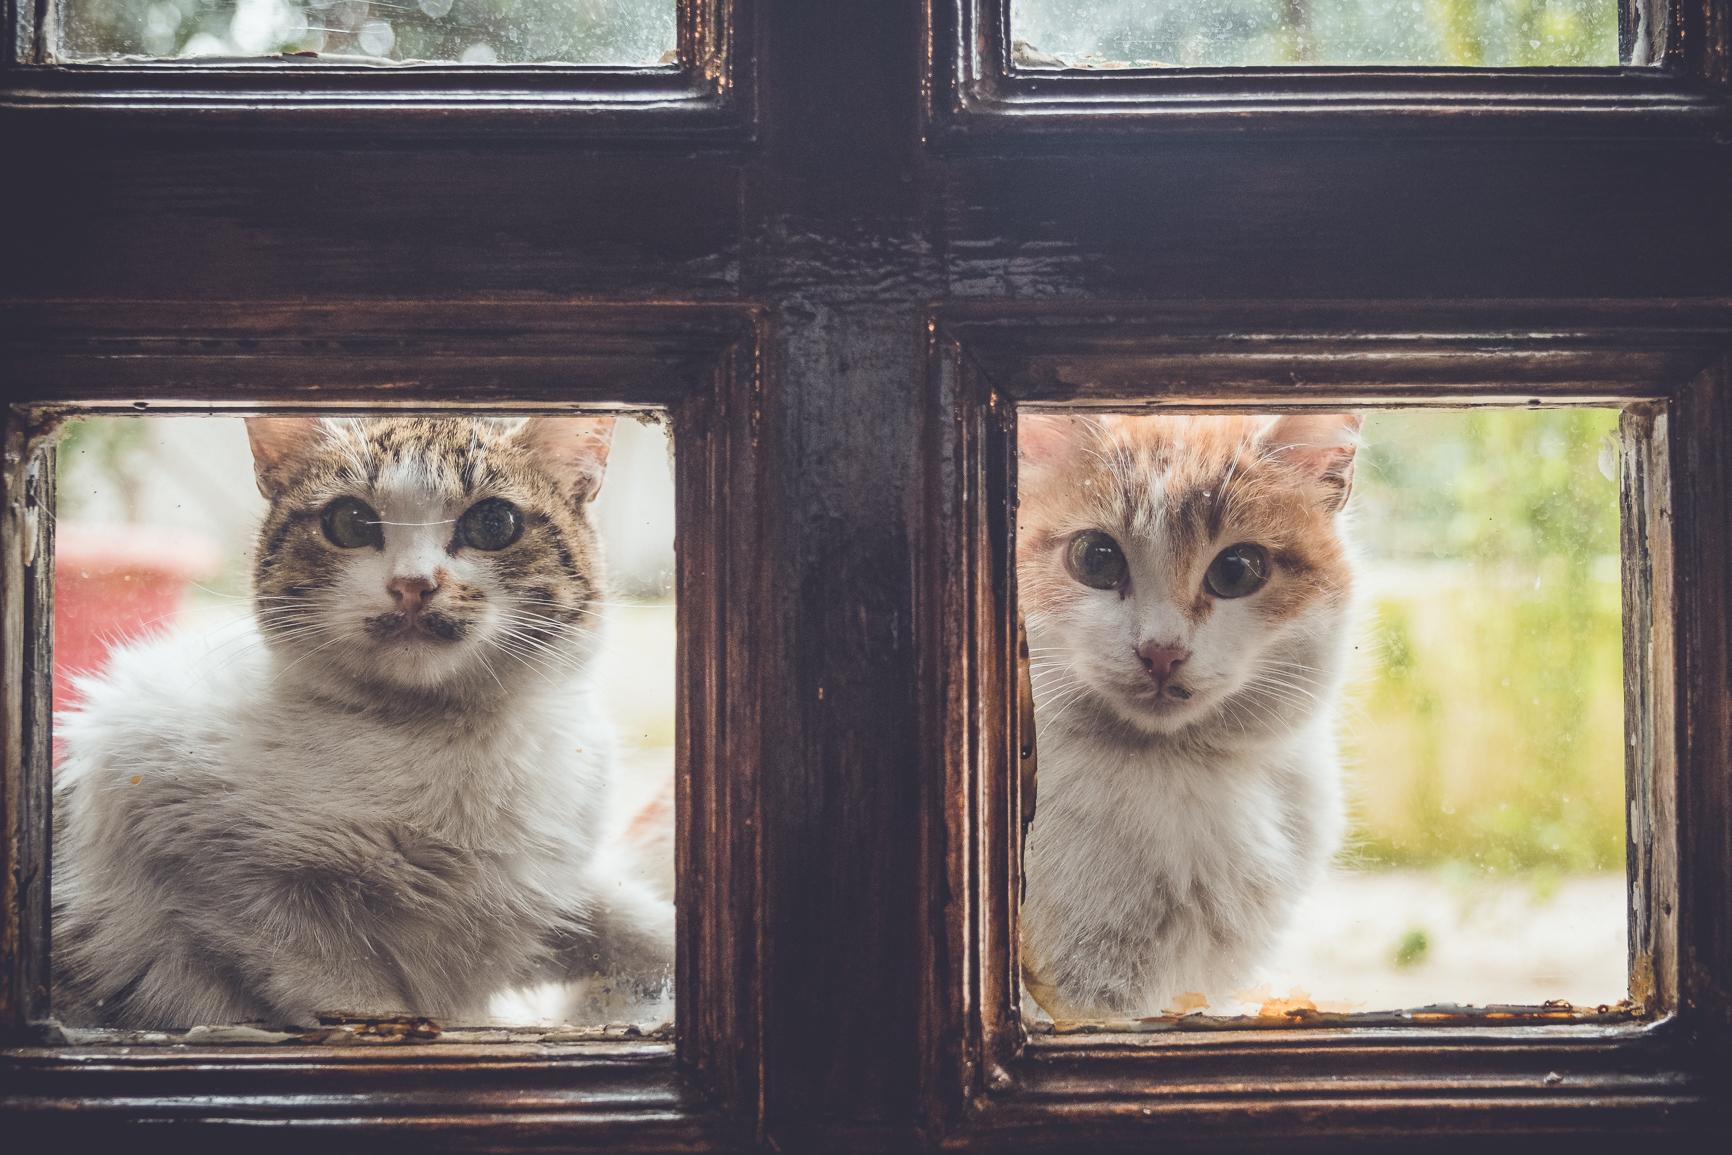 Kittens in the Despina restaurant